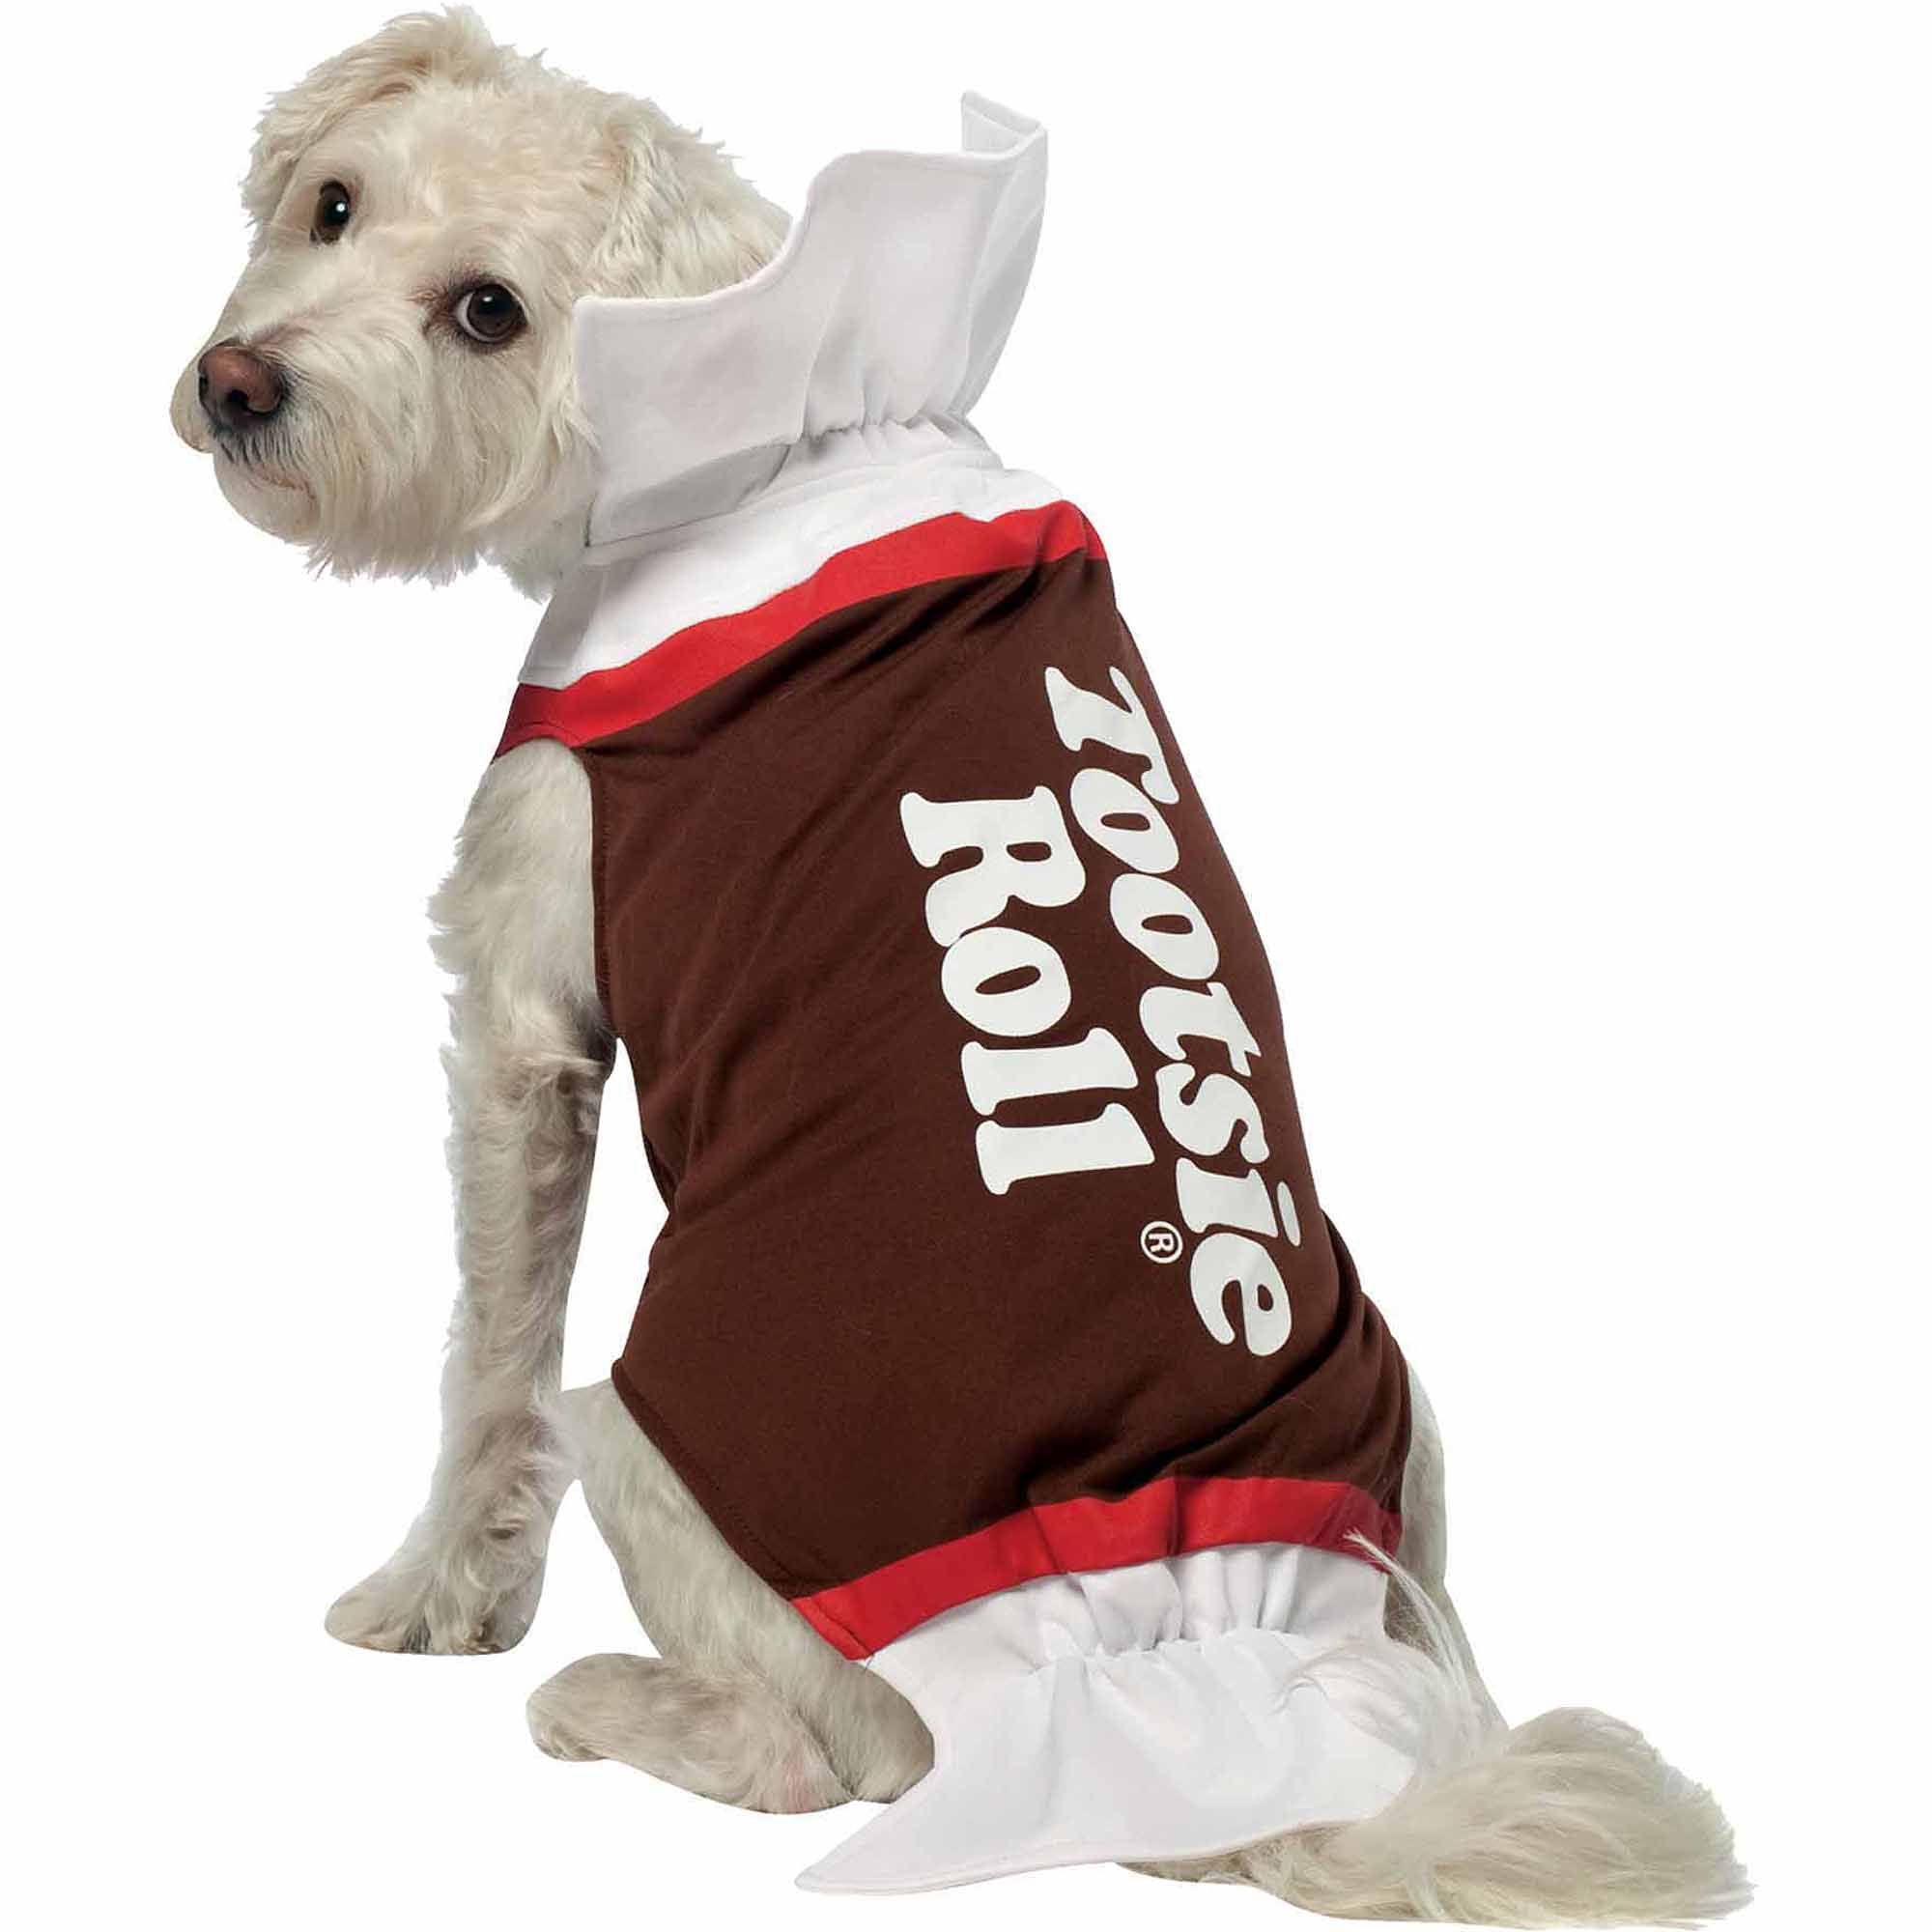 Tootsie Roll Dog Halloween Pet Costume (Multiple Sizes Available)